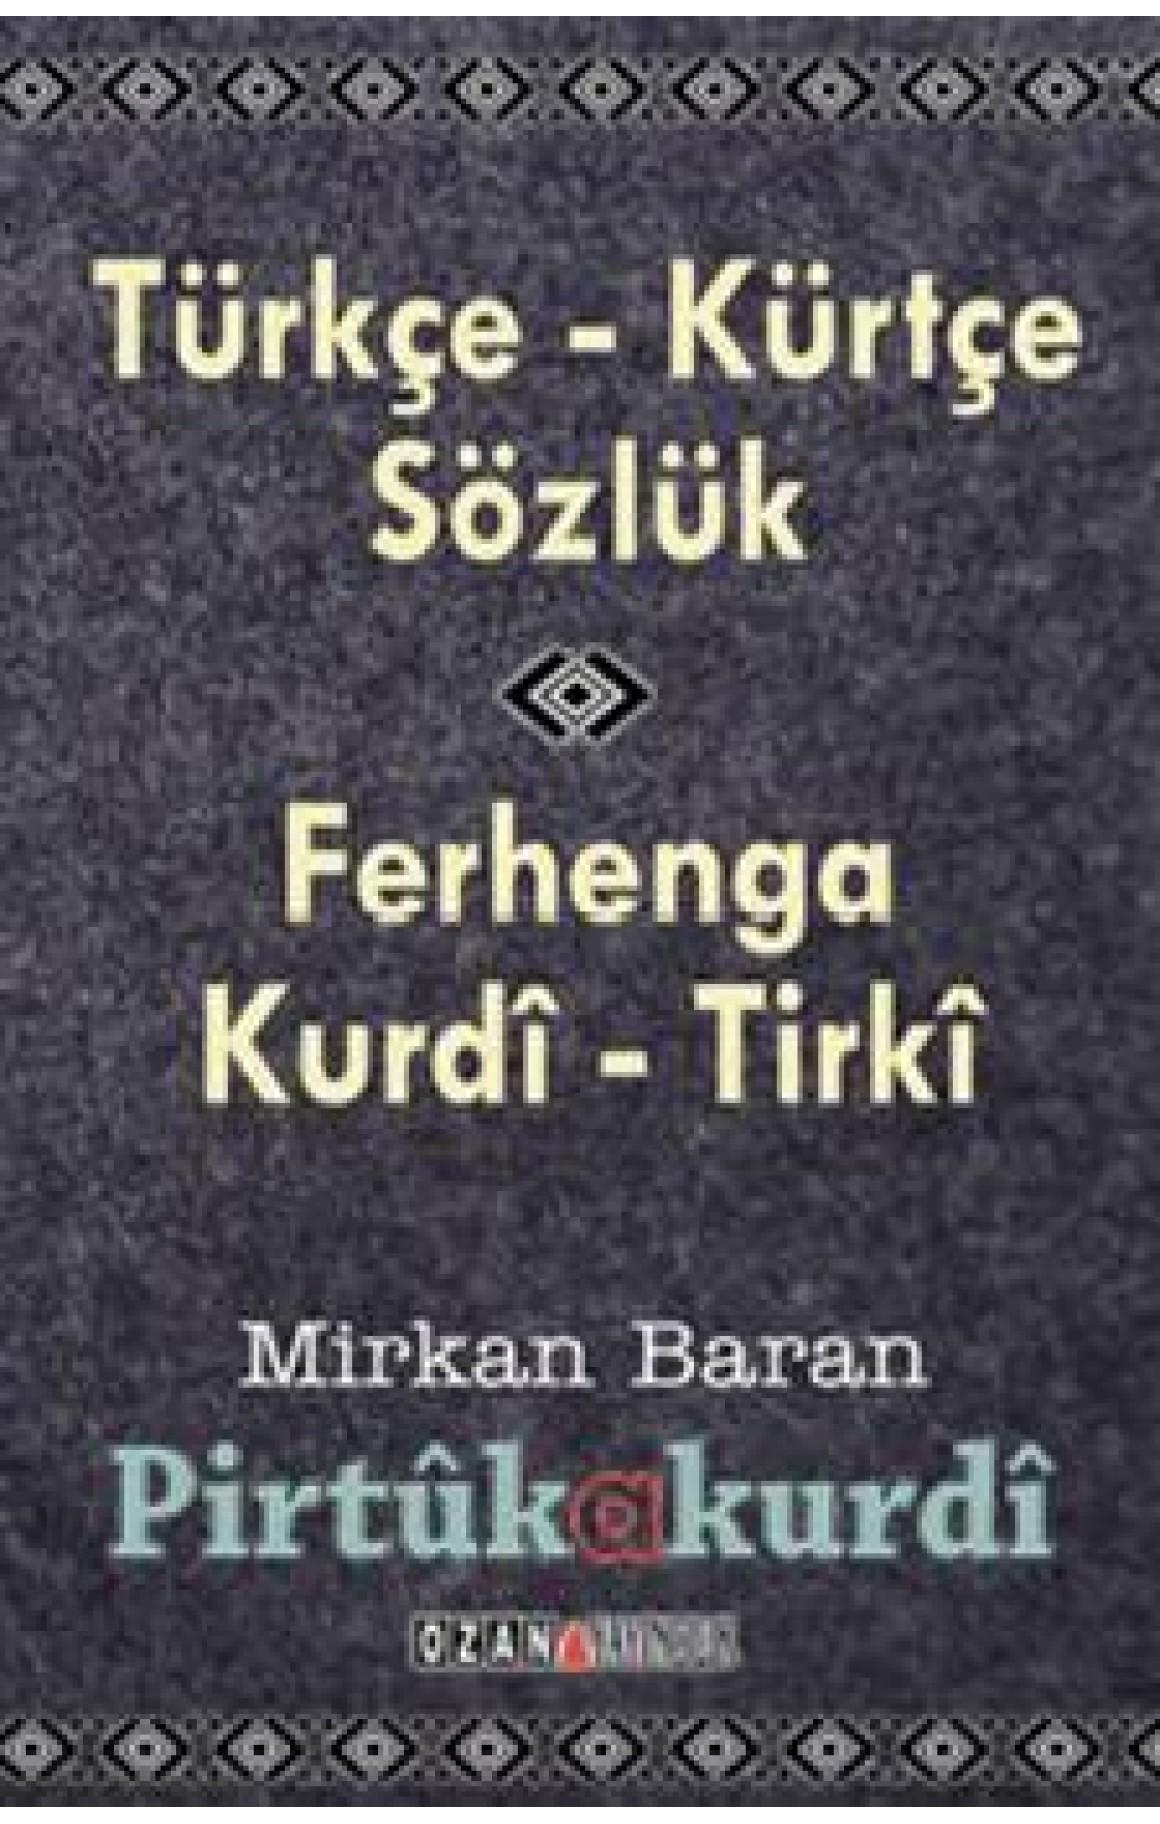 Kürtçe- Türkçe Sözlük Ferhenga Kurdî-Tirkî